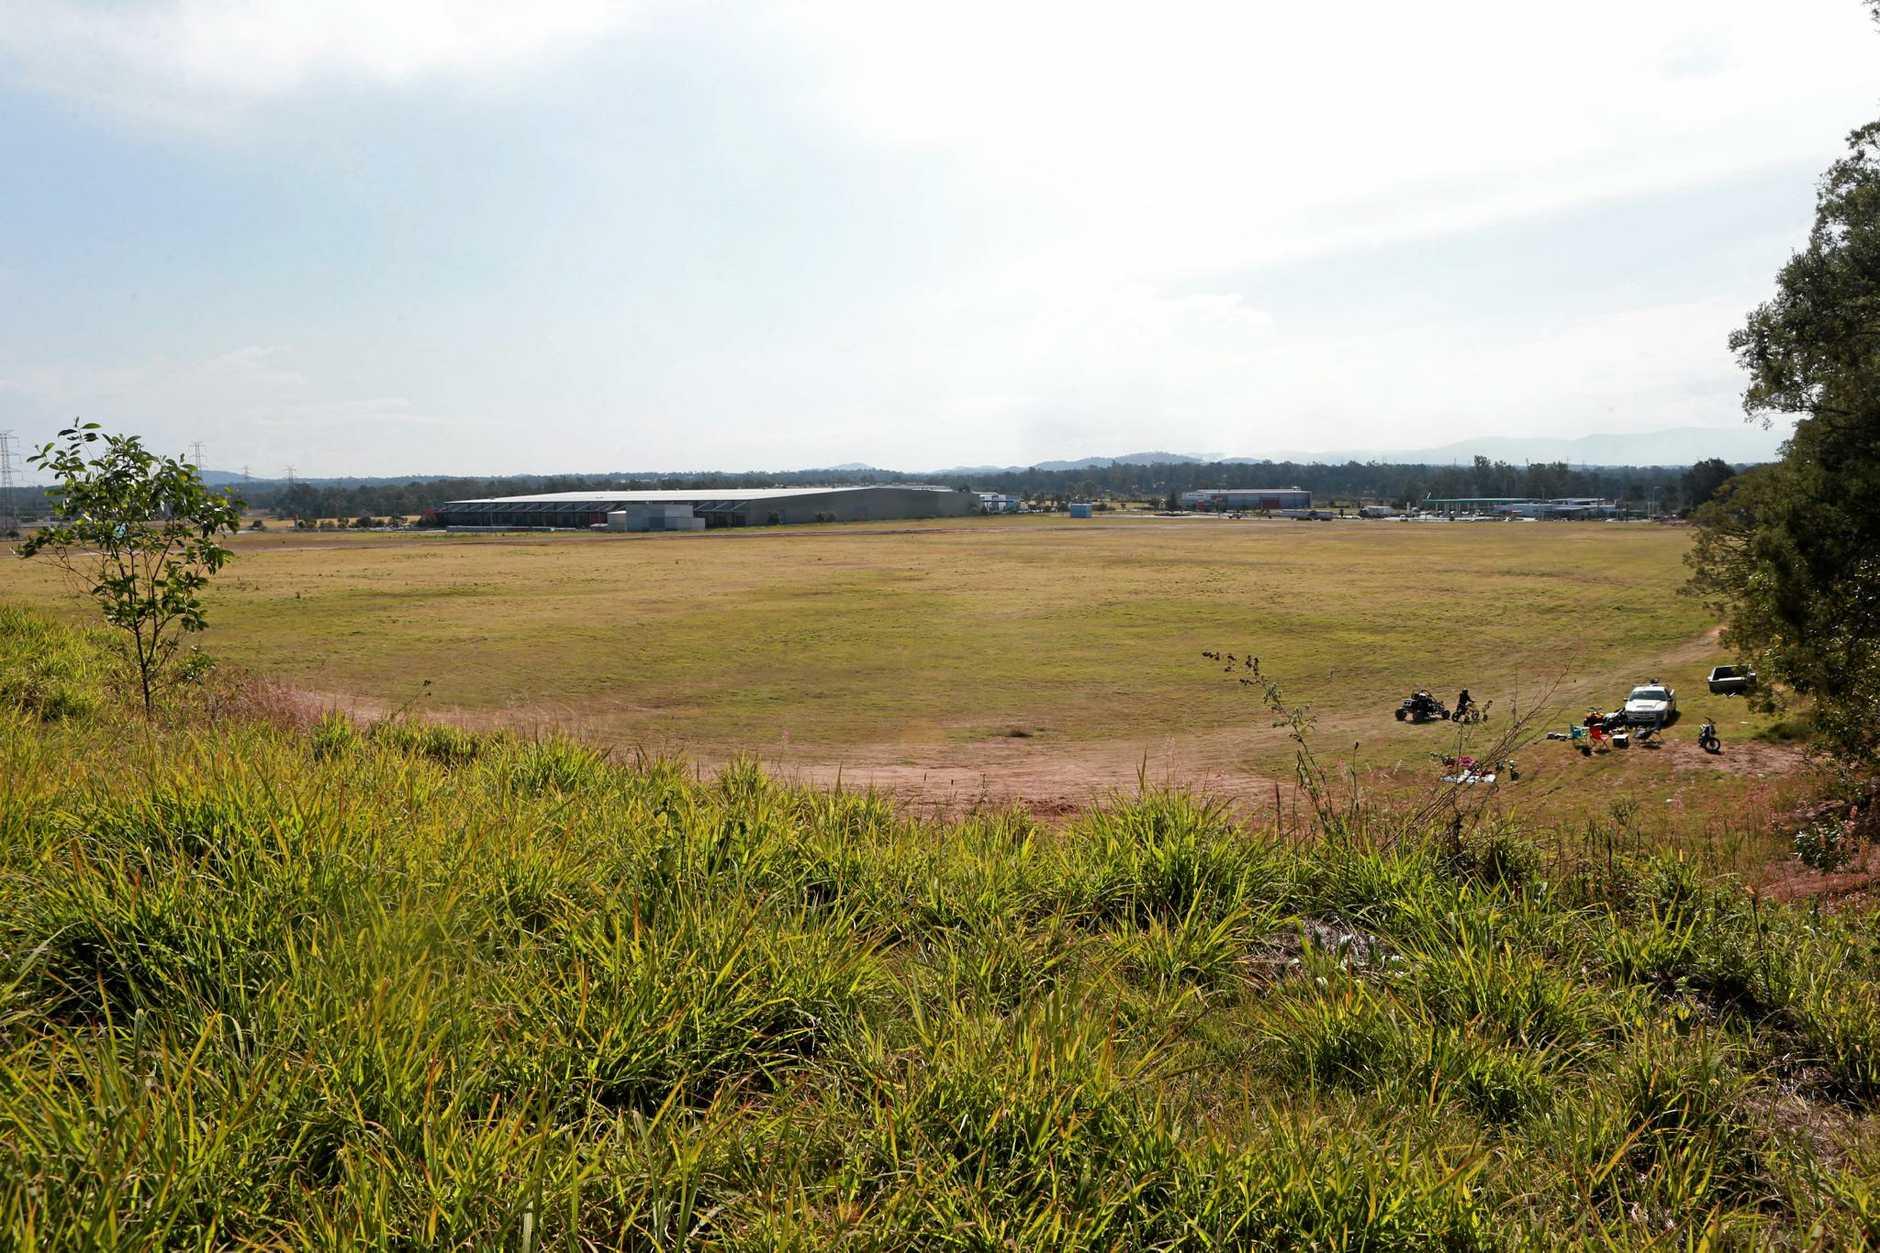 The Bundamba industrial block where Costco is set to be built.